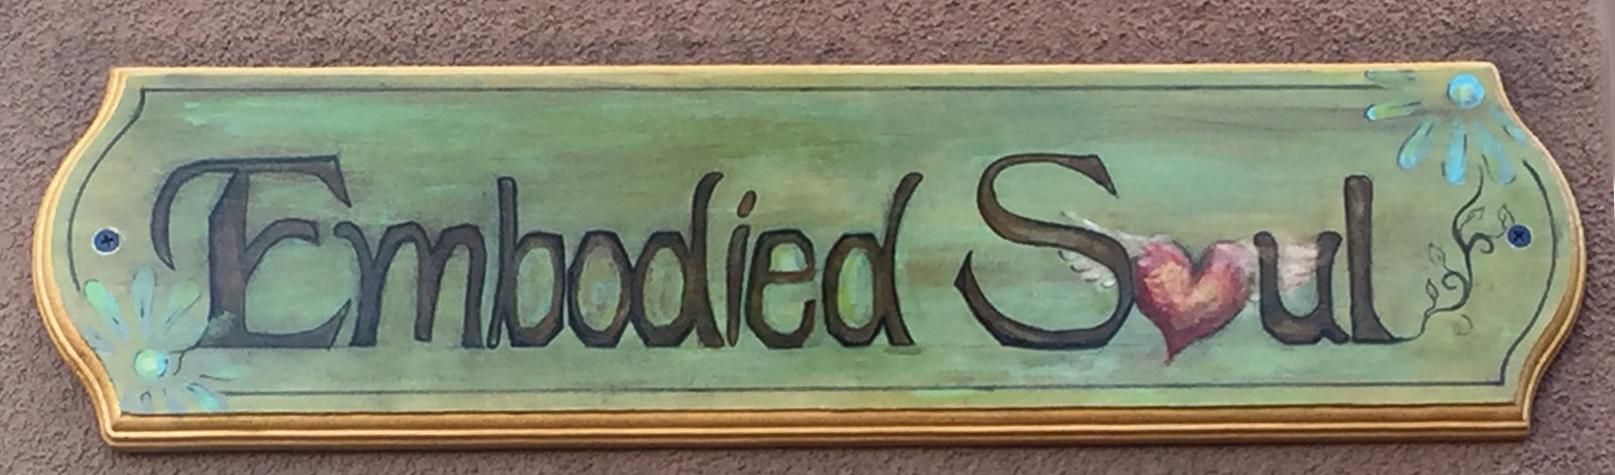 Embodied-Soul-Sign.jpg